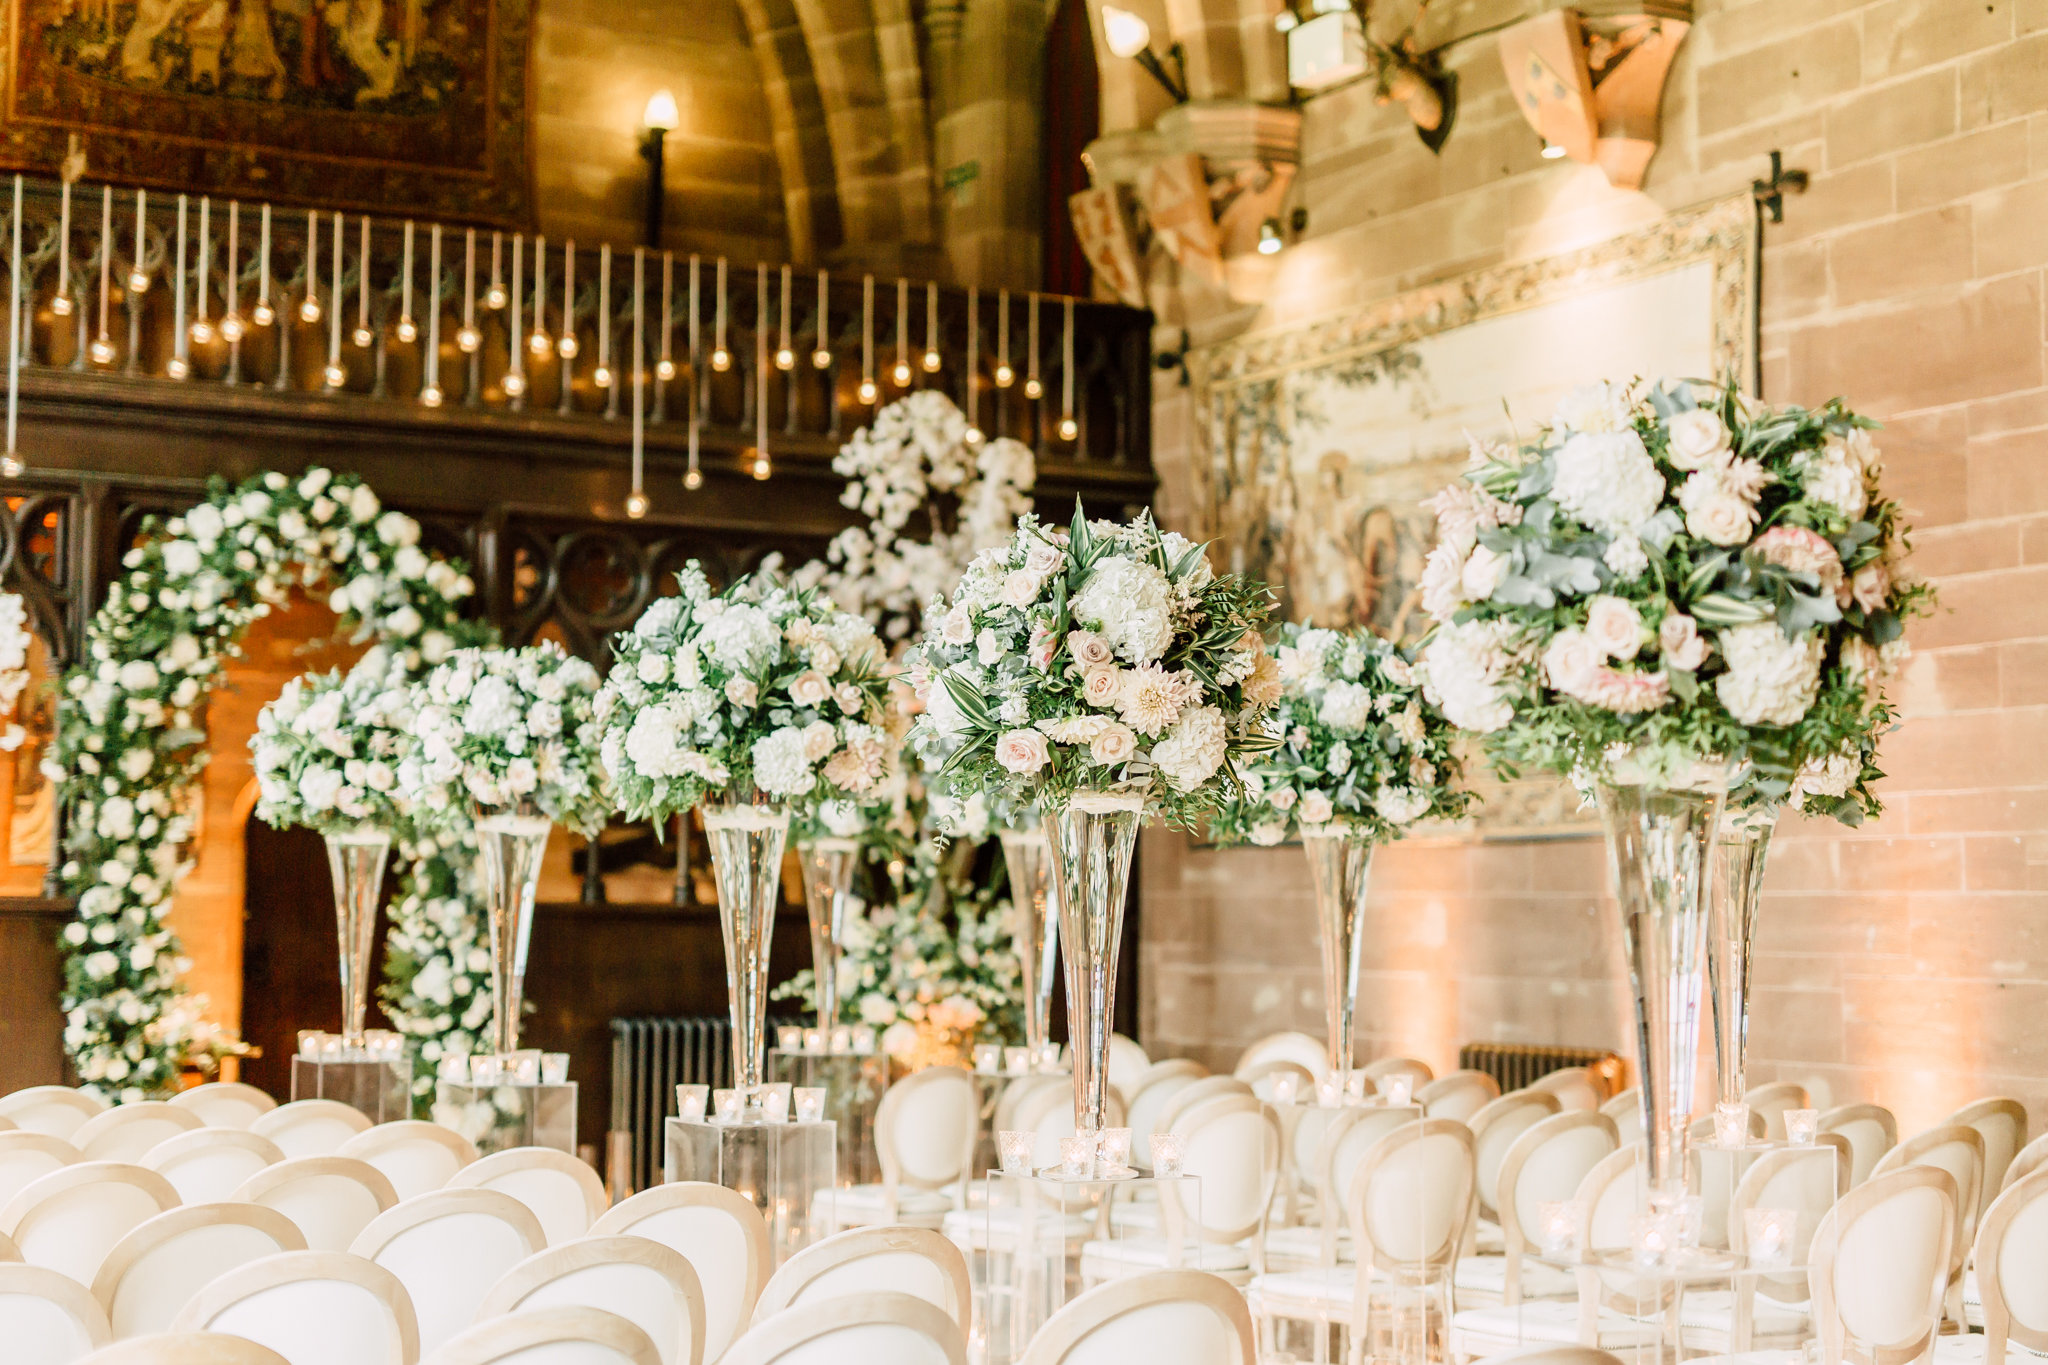 Photography: Heledd Roberts Photography, with Helen Ericksen Wedding Planning